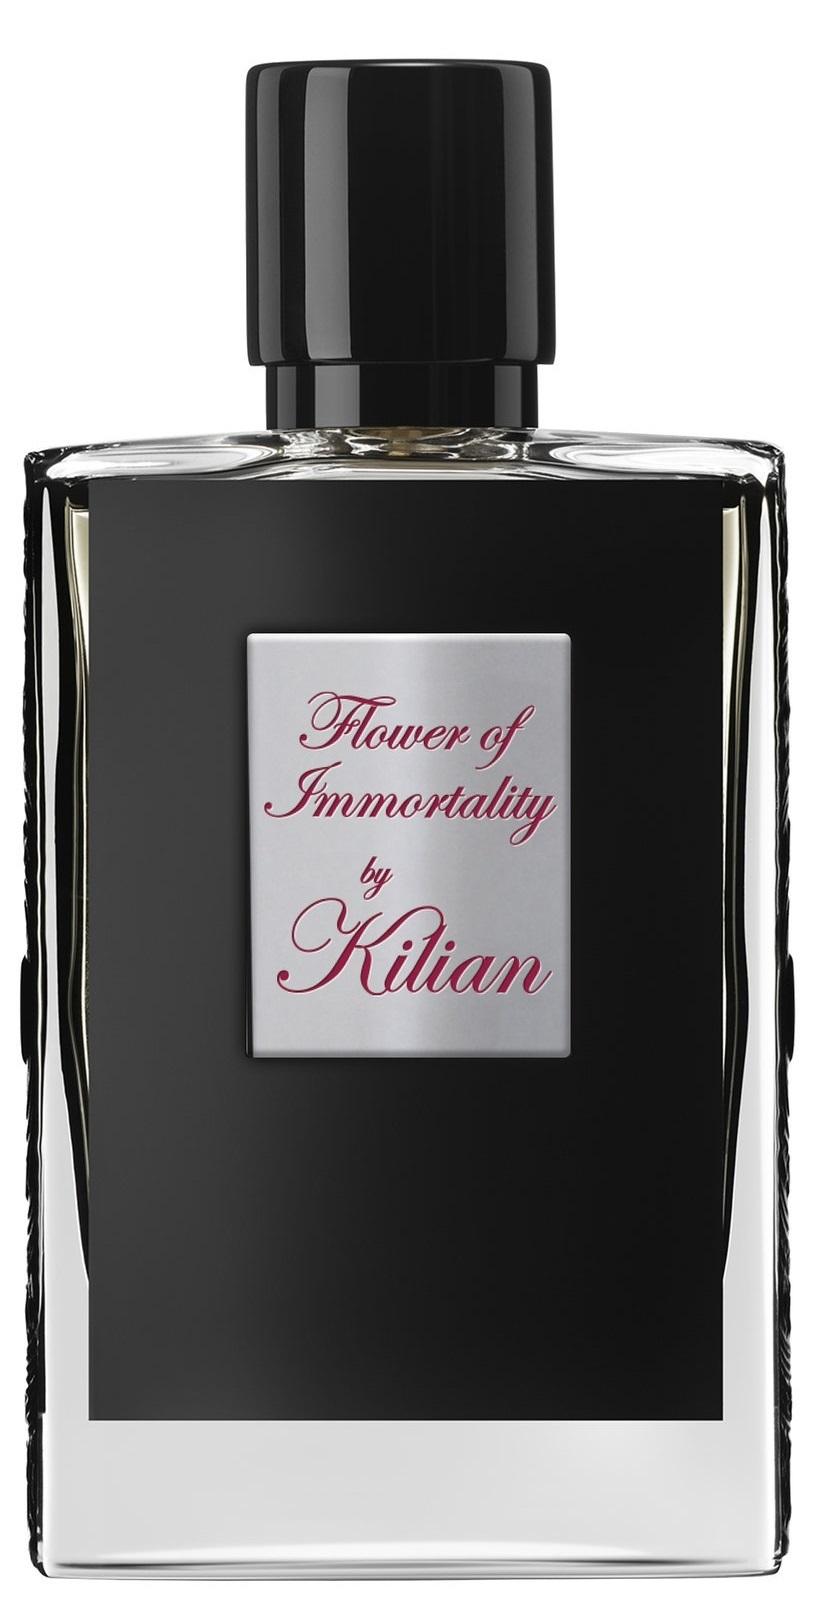 Kilian Flower of Immortality EDP